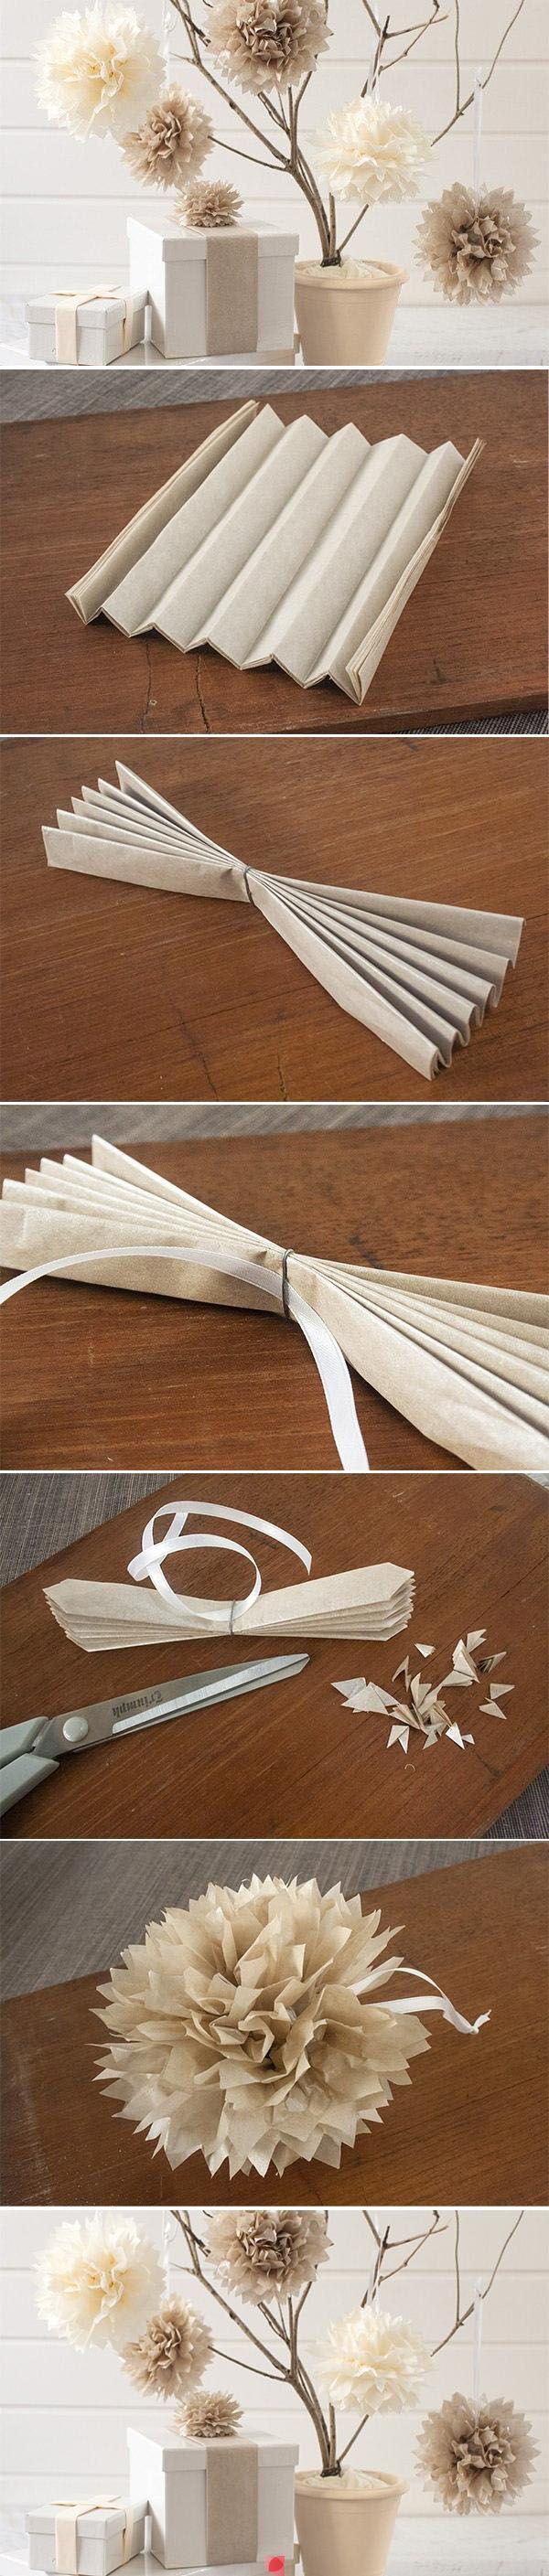 easy tutorial on tissue paper balls.